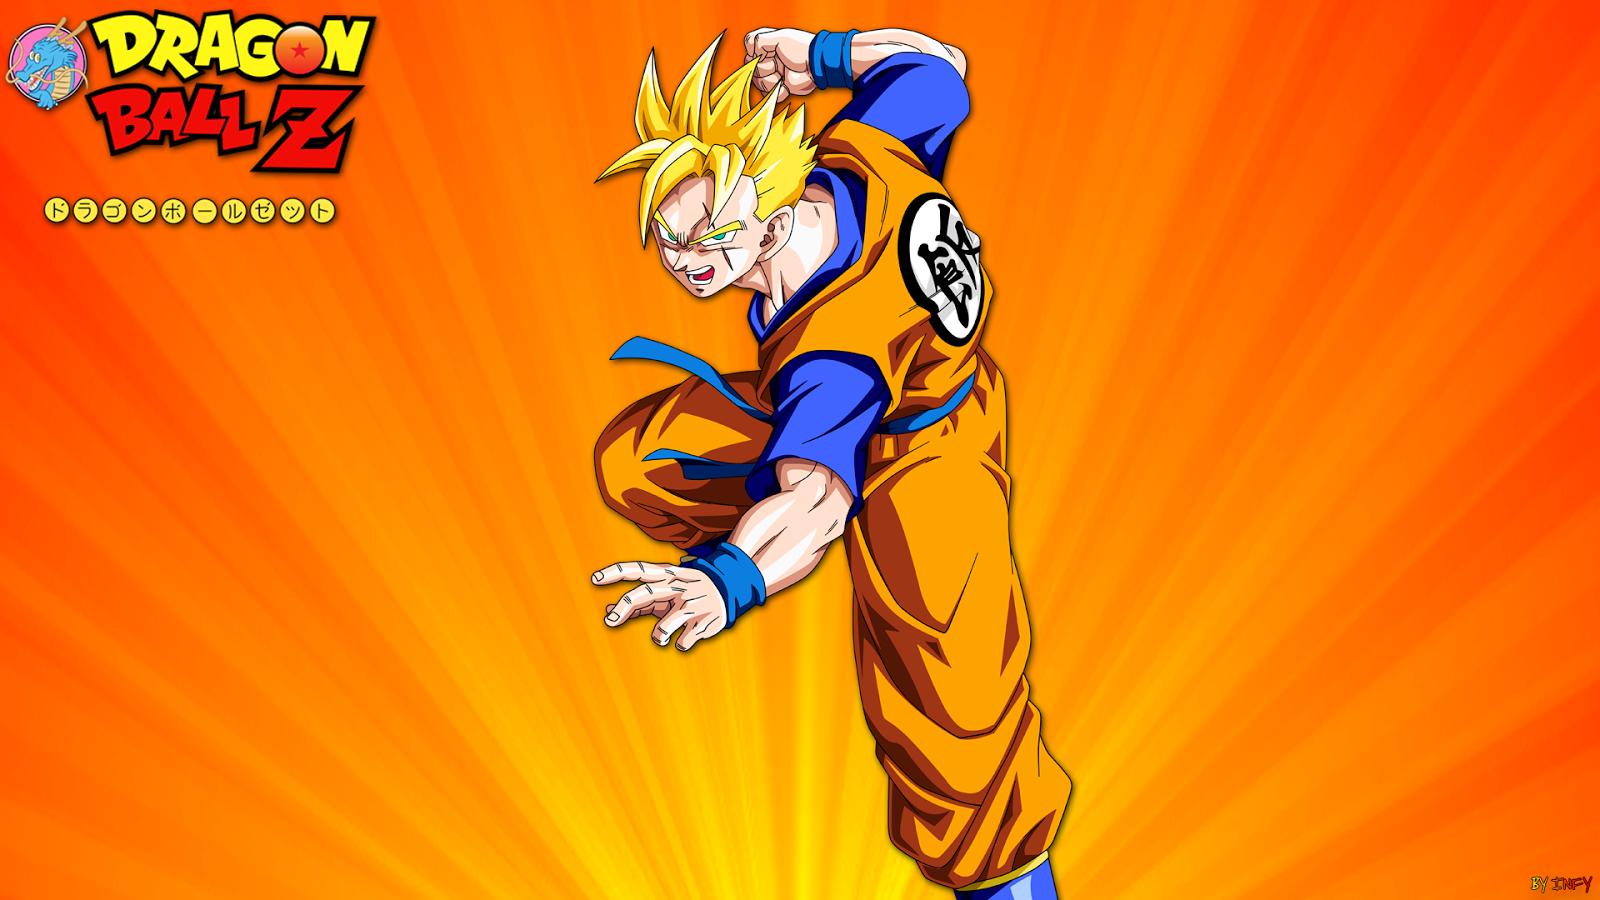 Download Wallpaper Hd Untuk Pc Download Dragon Ball Songoku Full Hd Wallpapers Hd